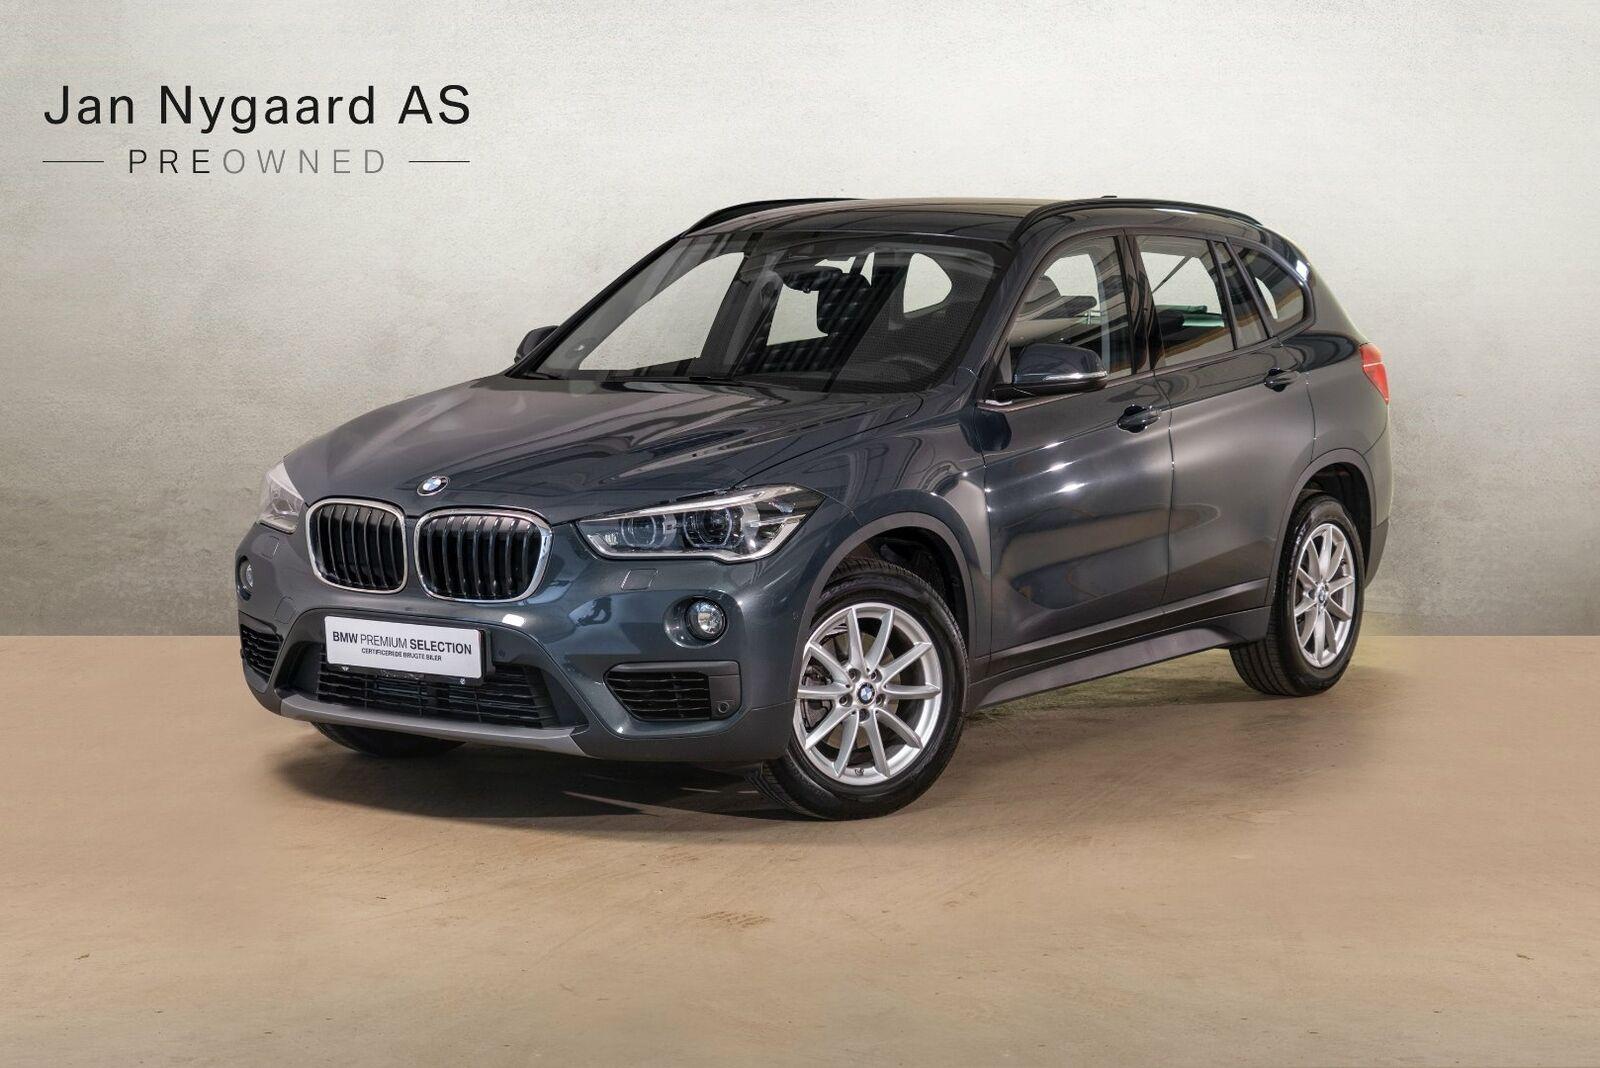 BMW X1 1,5 sDrive18i 5d - 389.000 kr.